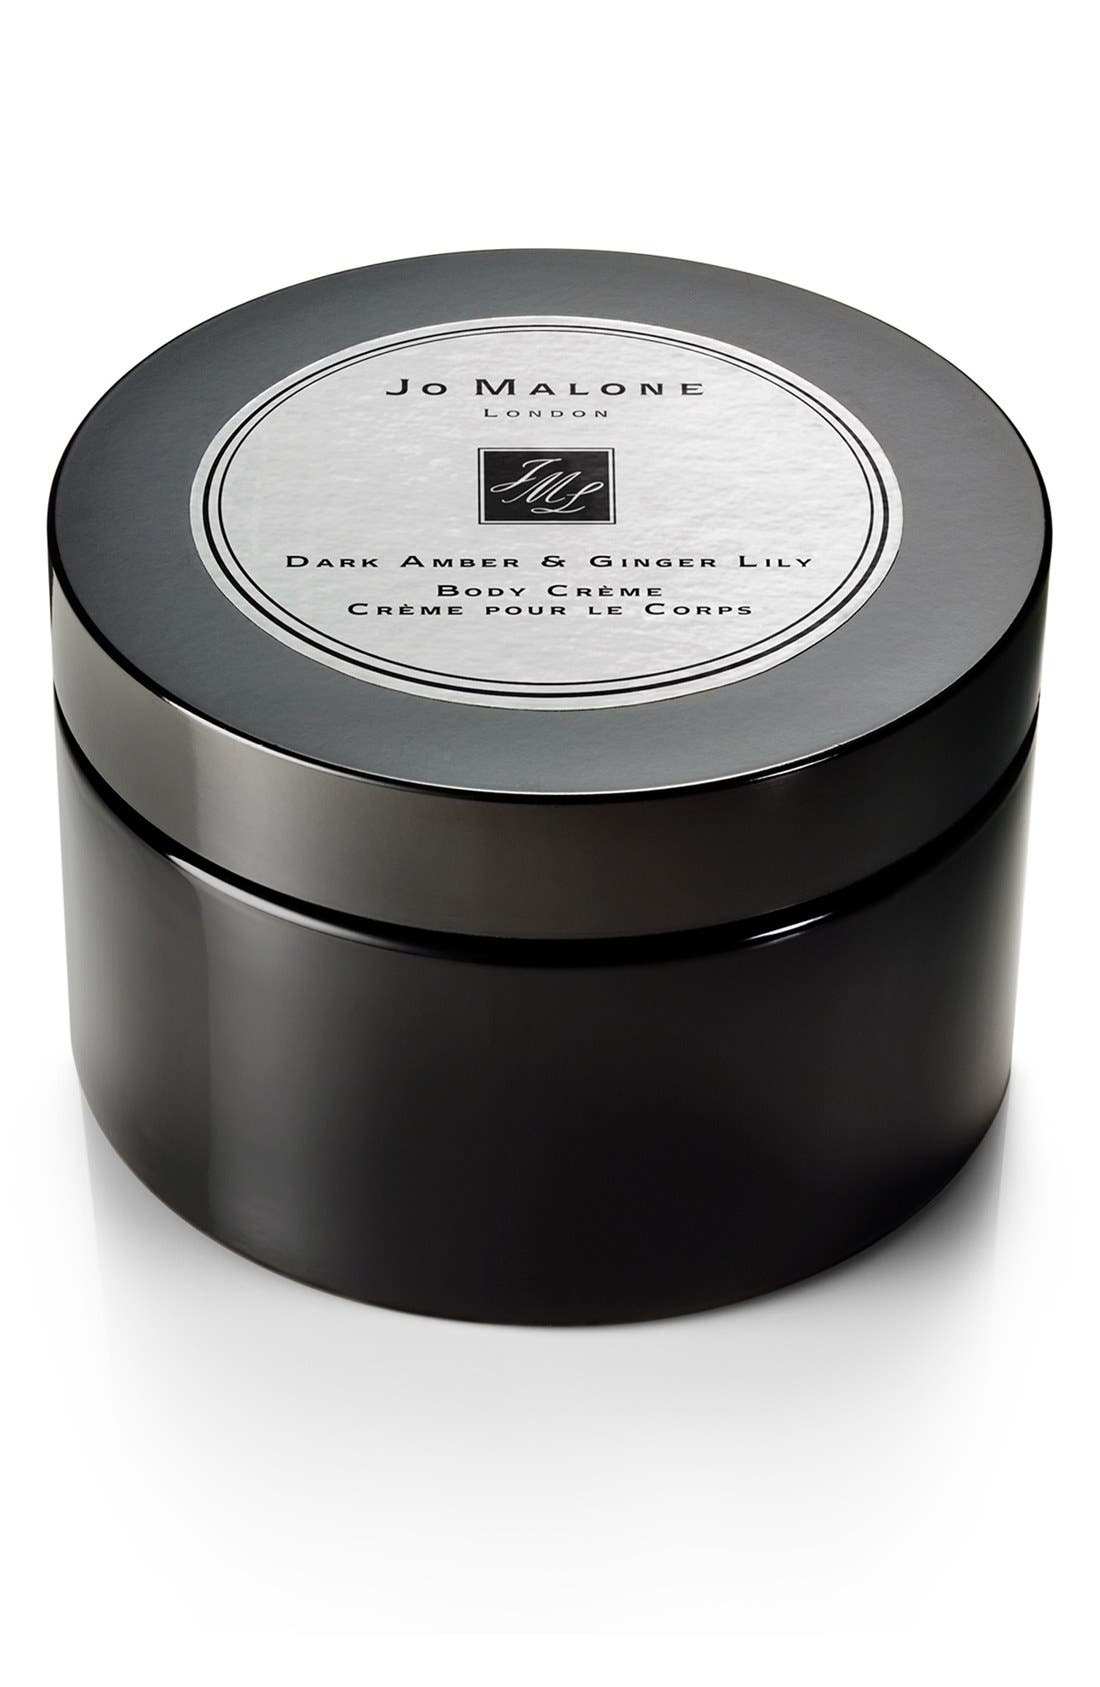 Jo Malone London™ 'Dark Amber & Ginger Lily' Body Crème